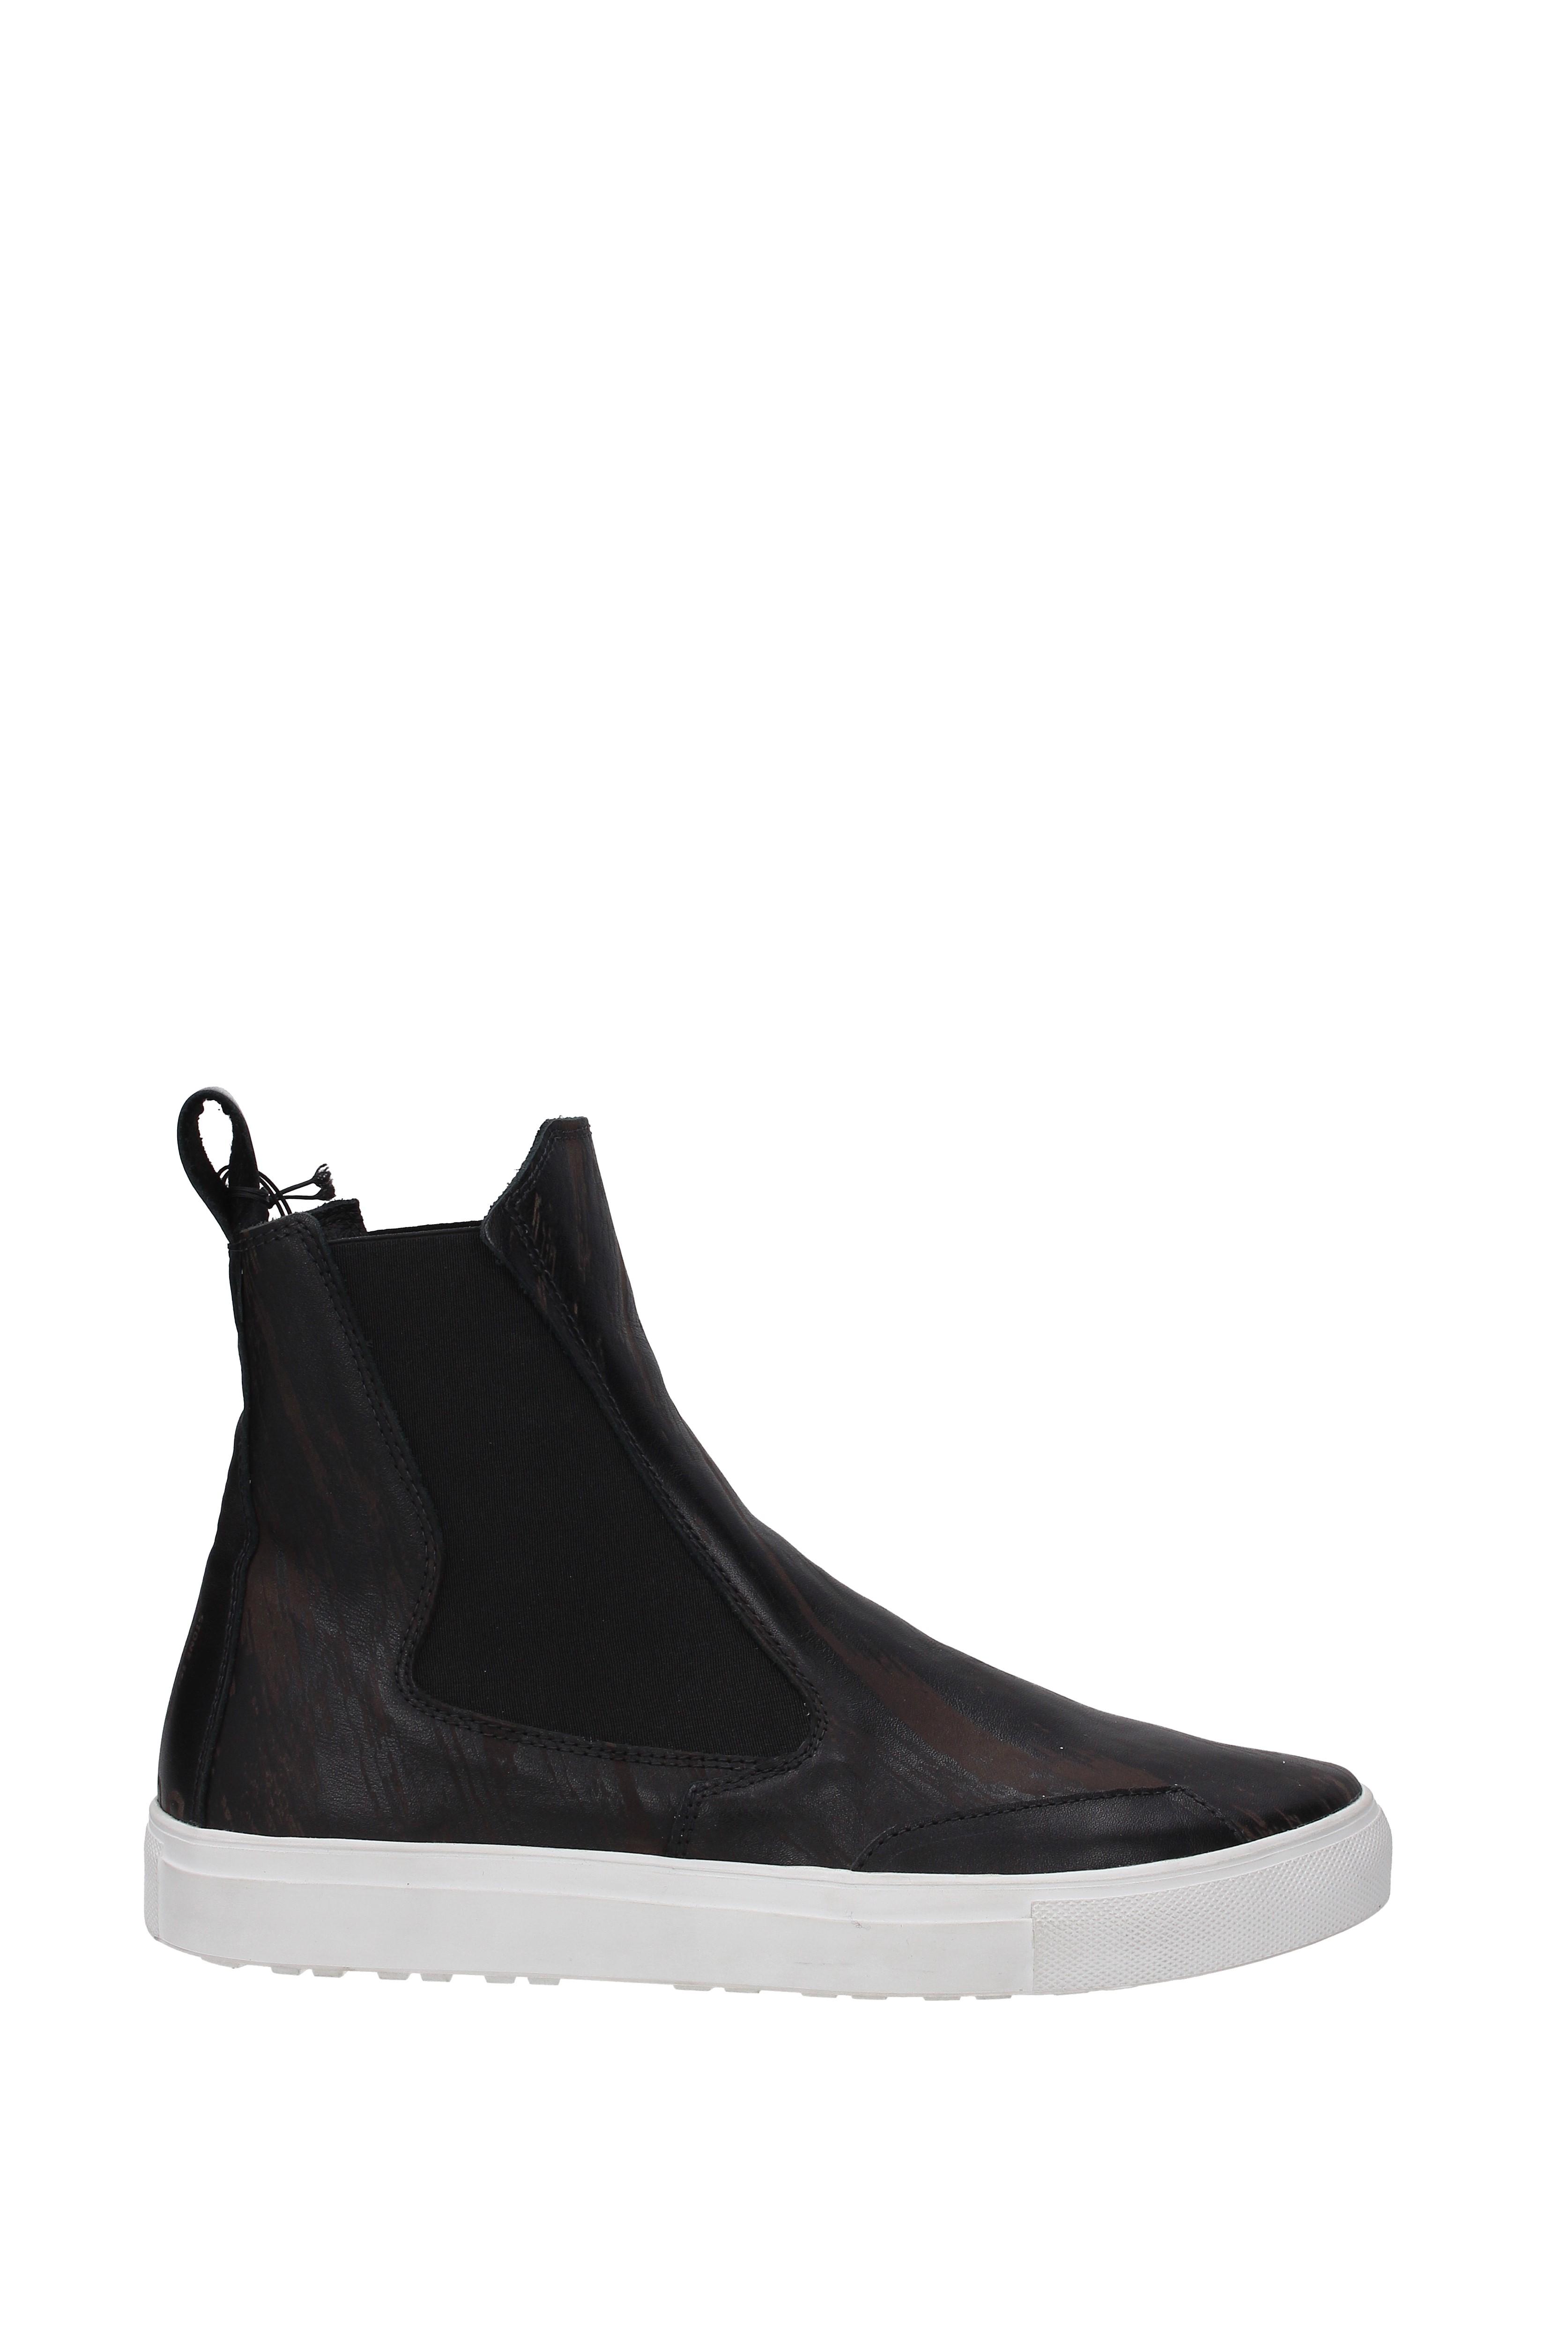 Sneakers Stone Island Island Island Herren - Leder (6719S0222V0029) c21065